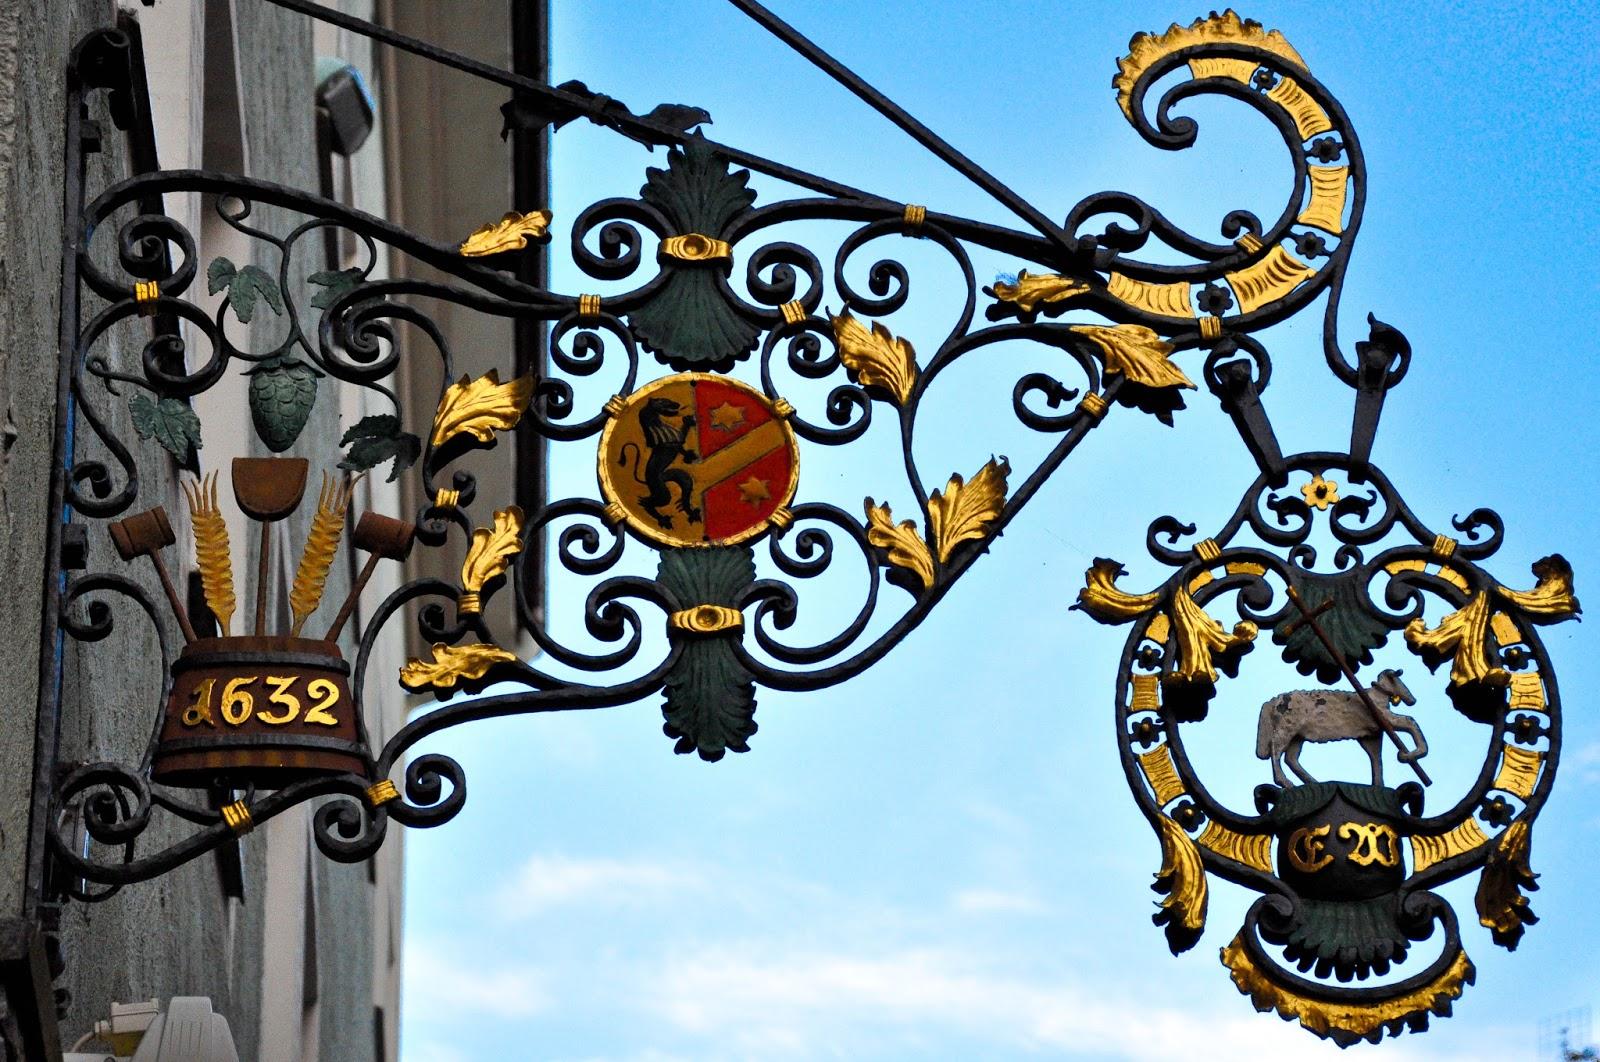 Shop Sign, Kaufbeuren, Bavaria, Germany